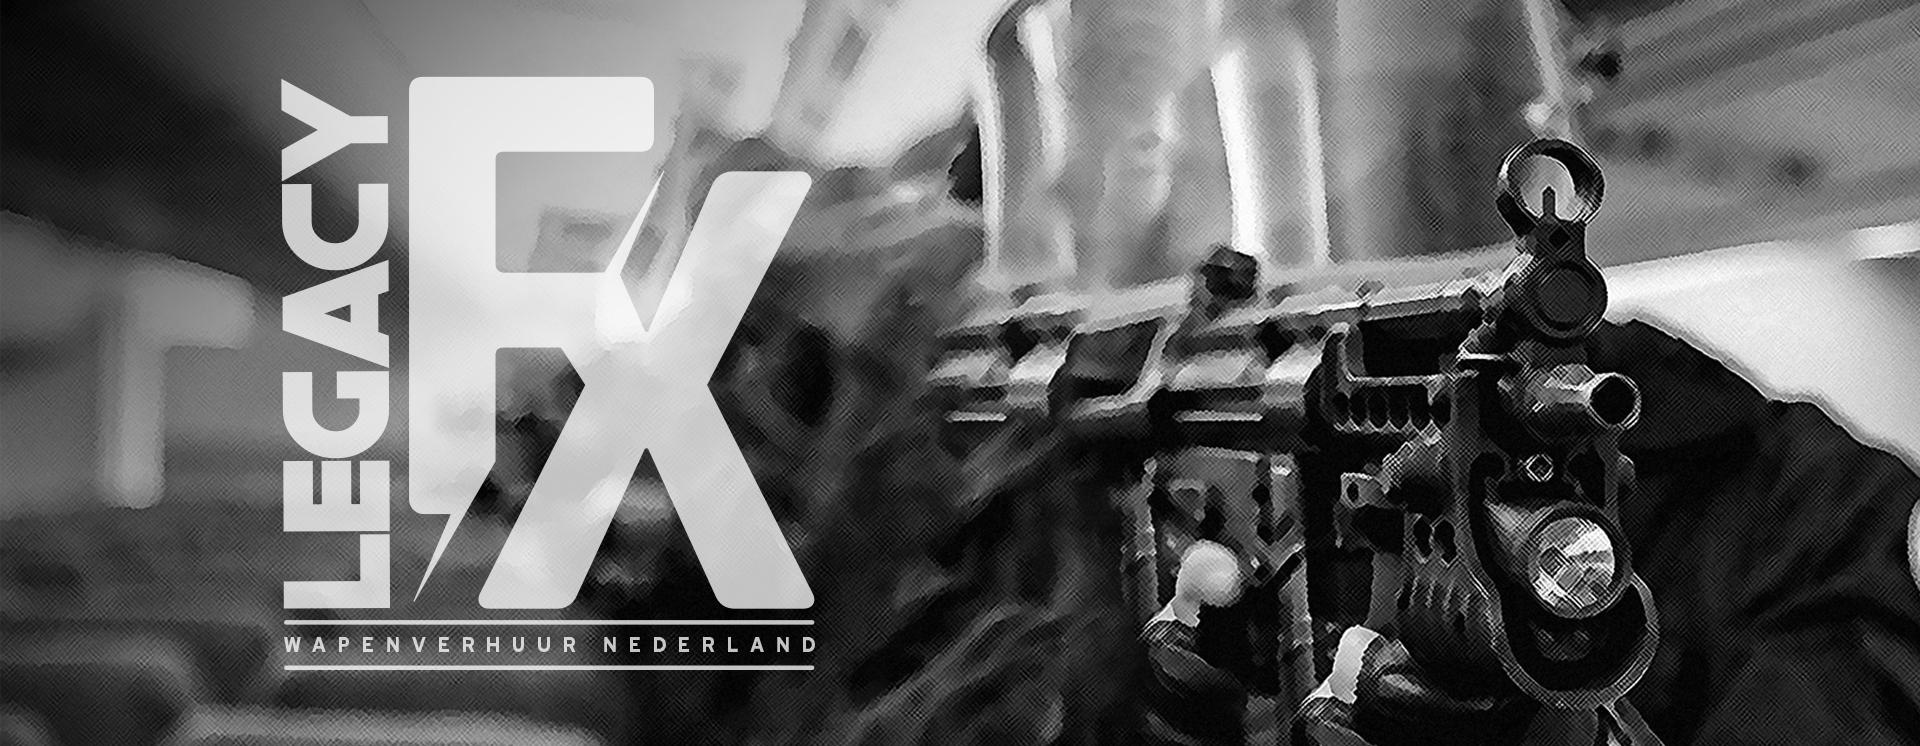 Legacy FX wapenverhuur